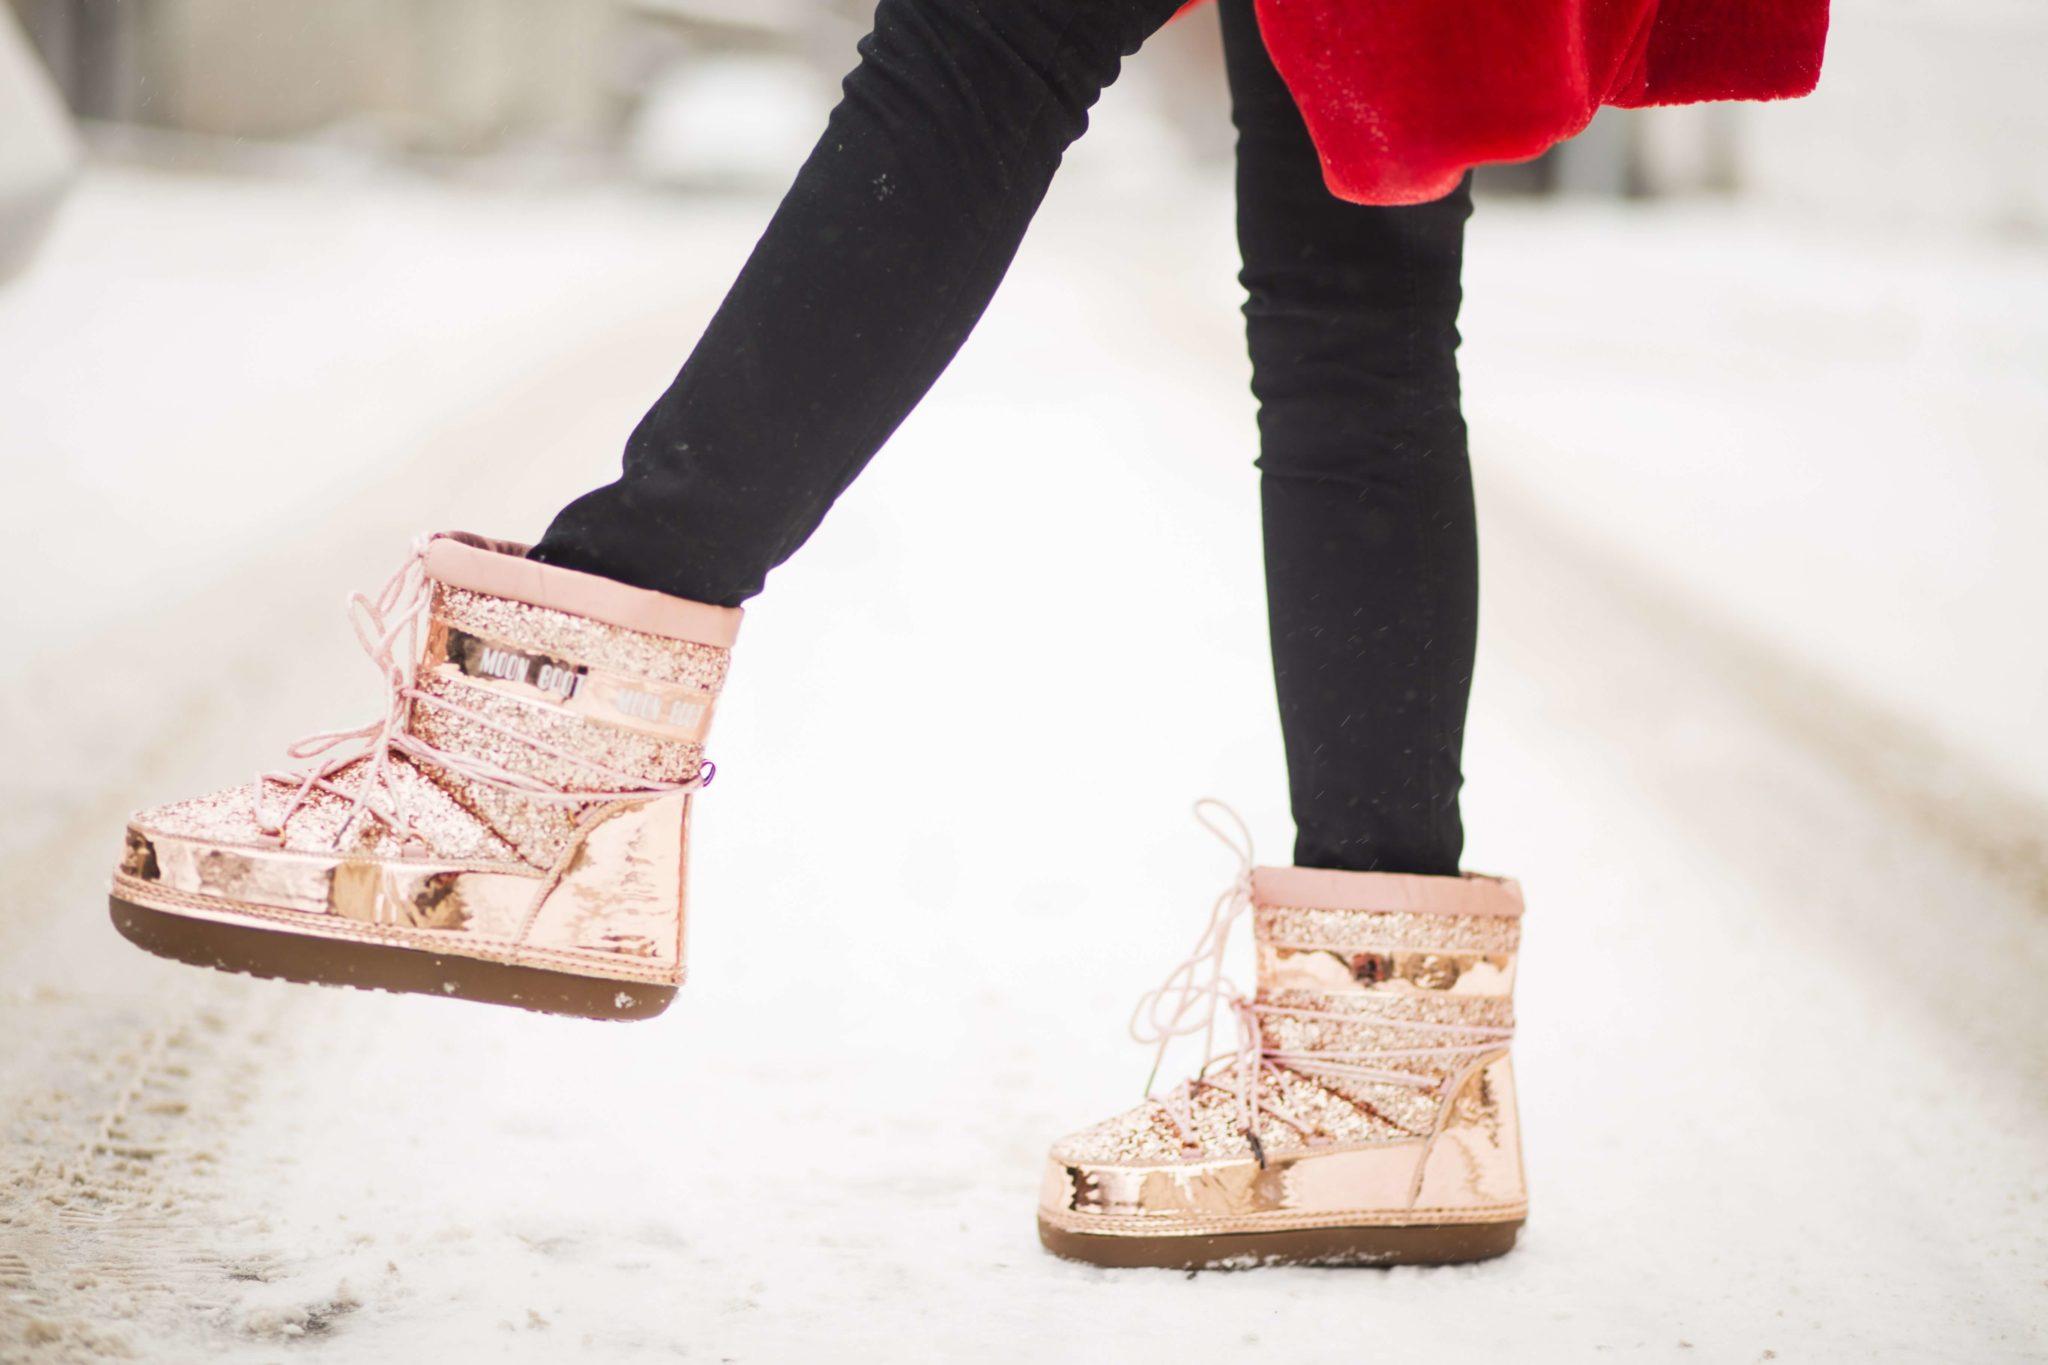 Osoba robi krok w butach